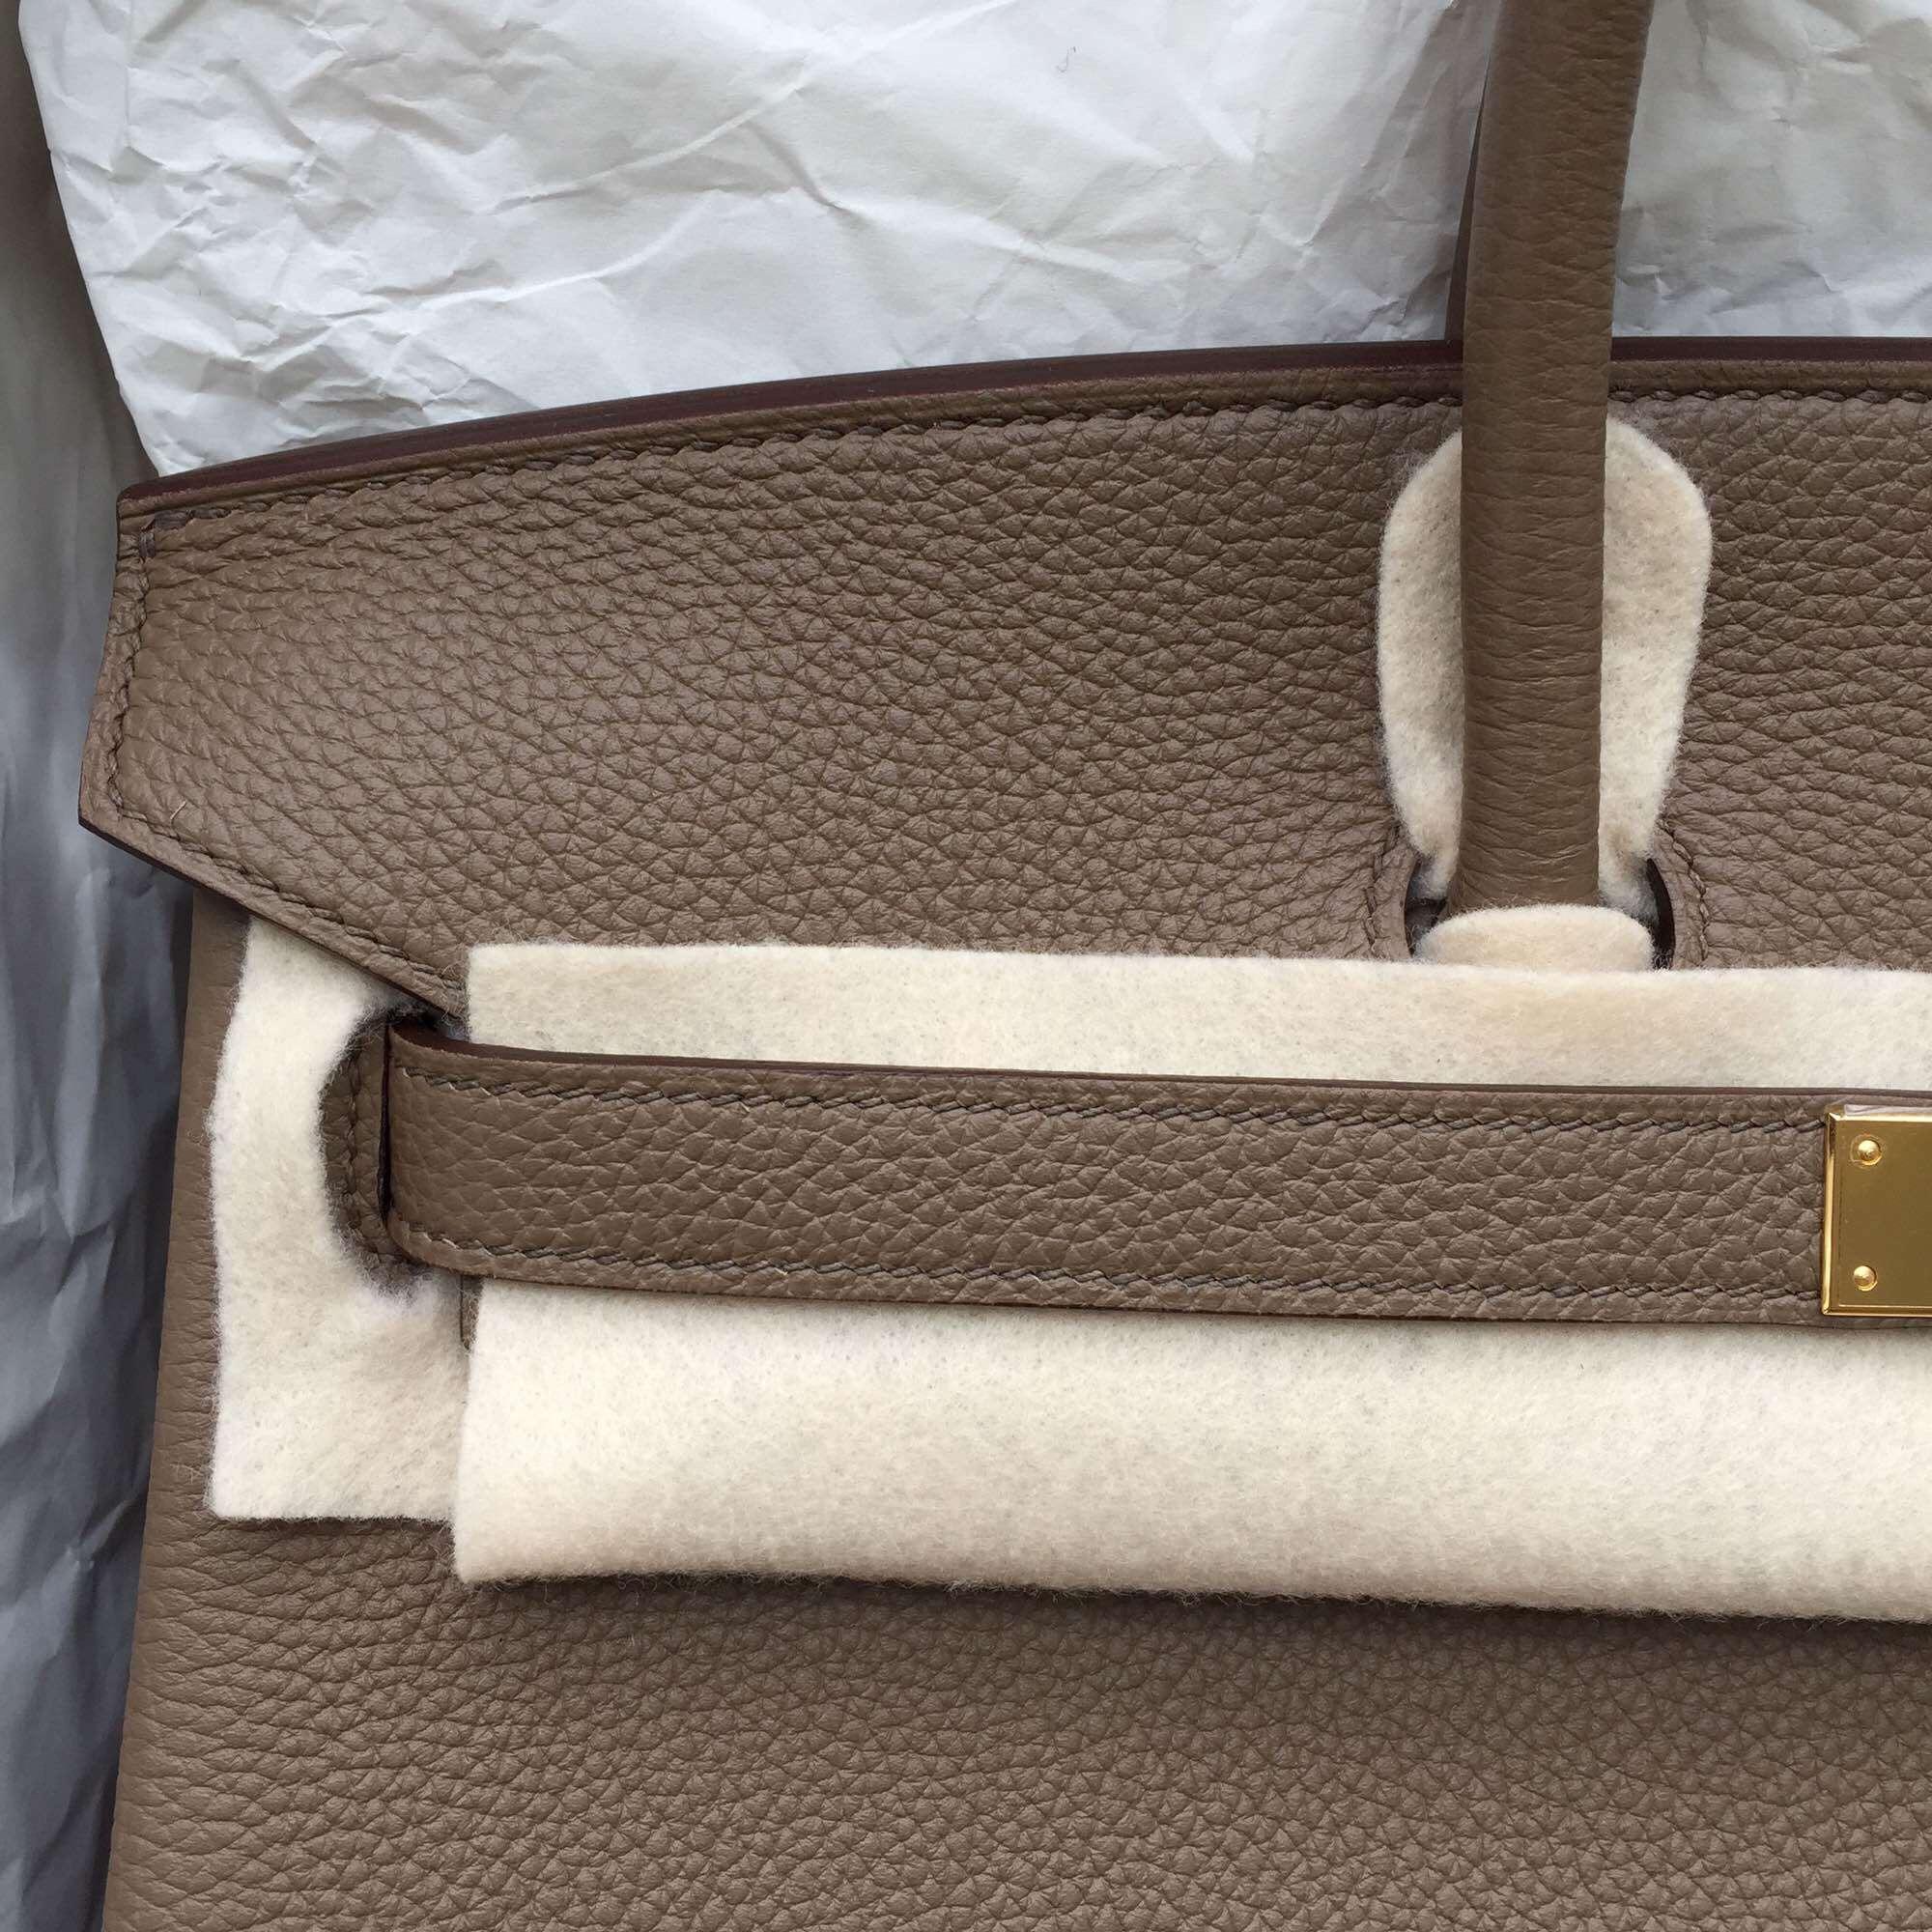 Cheap C18 Etoupe Grey Togo Leather Hermes Birkin Bag Women's Handbag 35CM